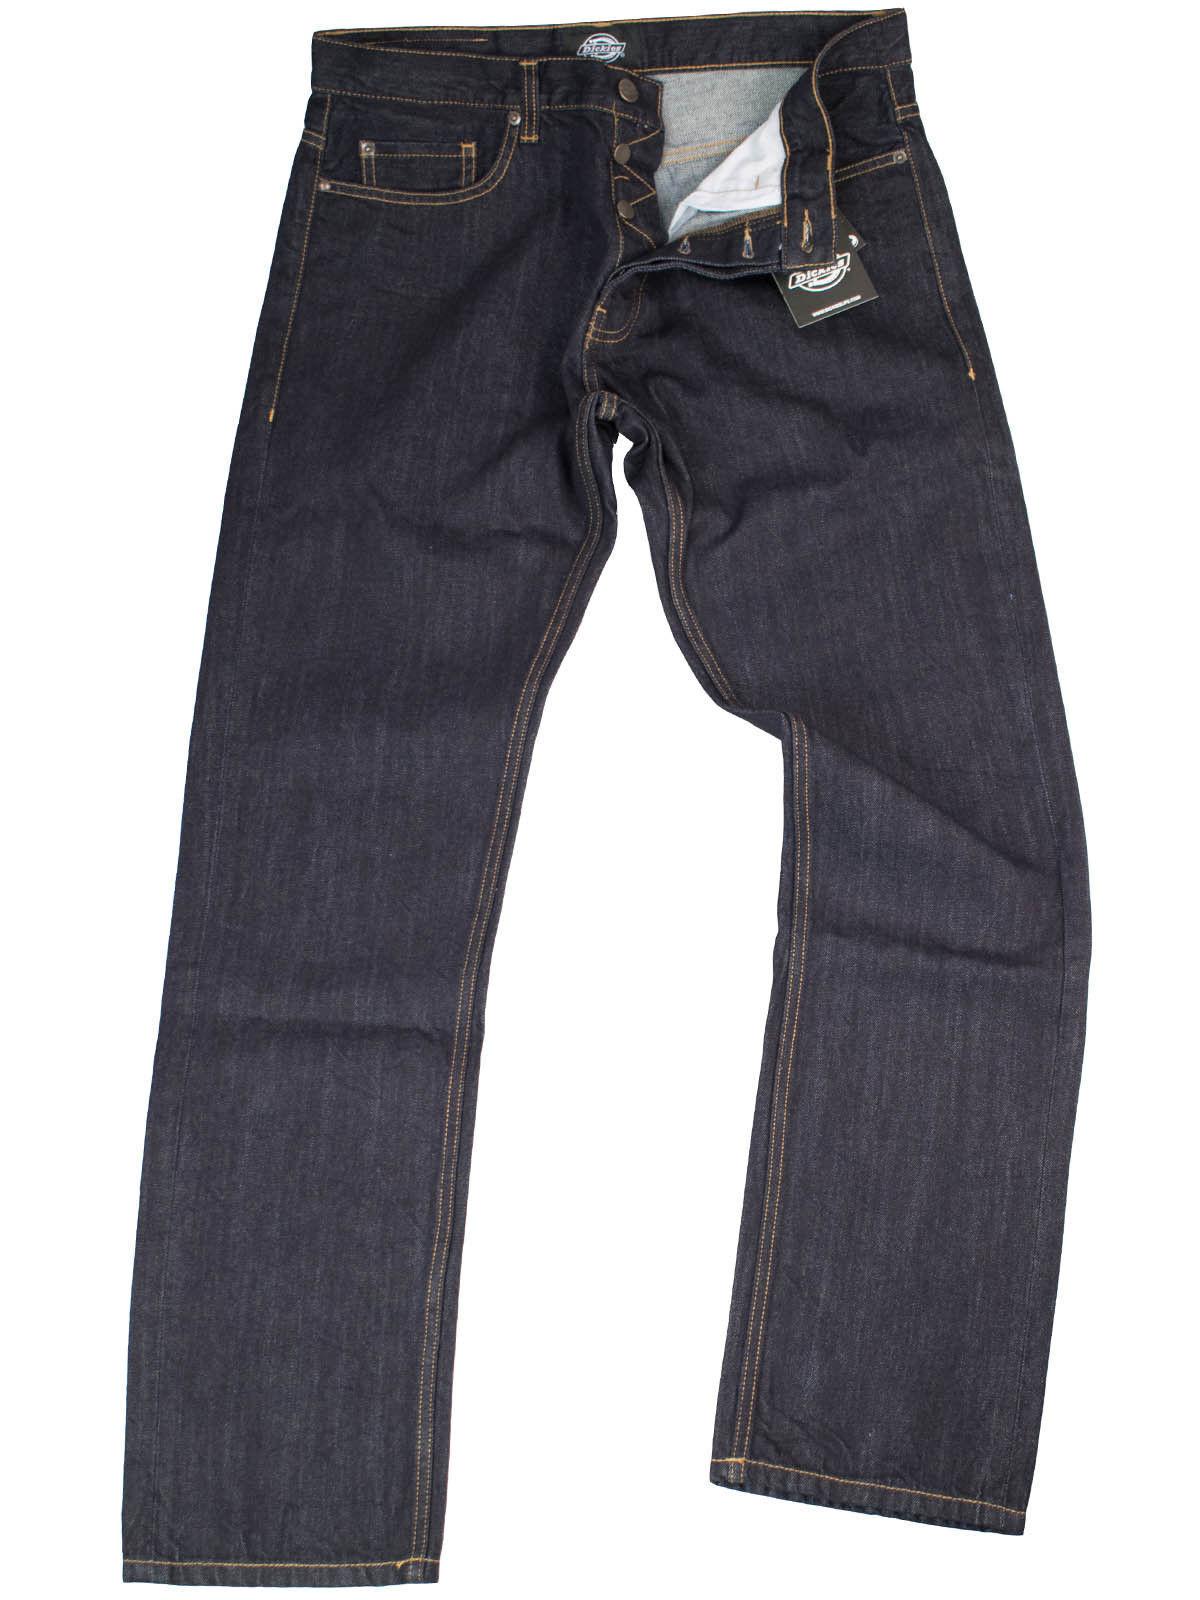 Dickies Jeans Michigan Michigan Michigan Rinsed 5 Pocket Denim Blaujeans Rockabilly  5007 5954b3